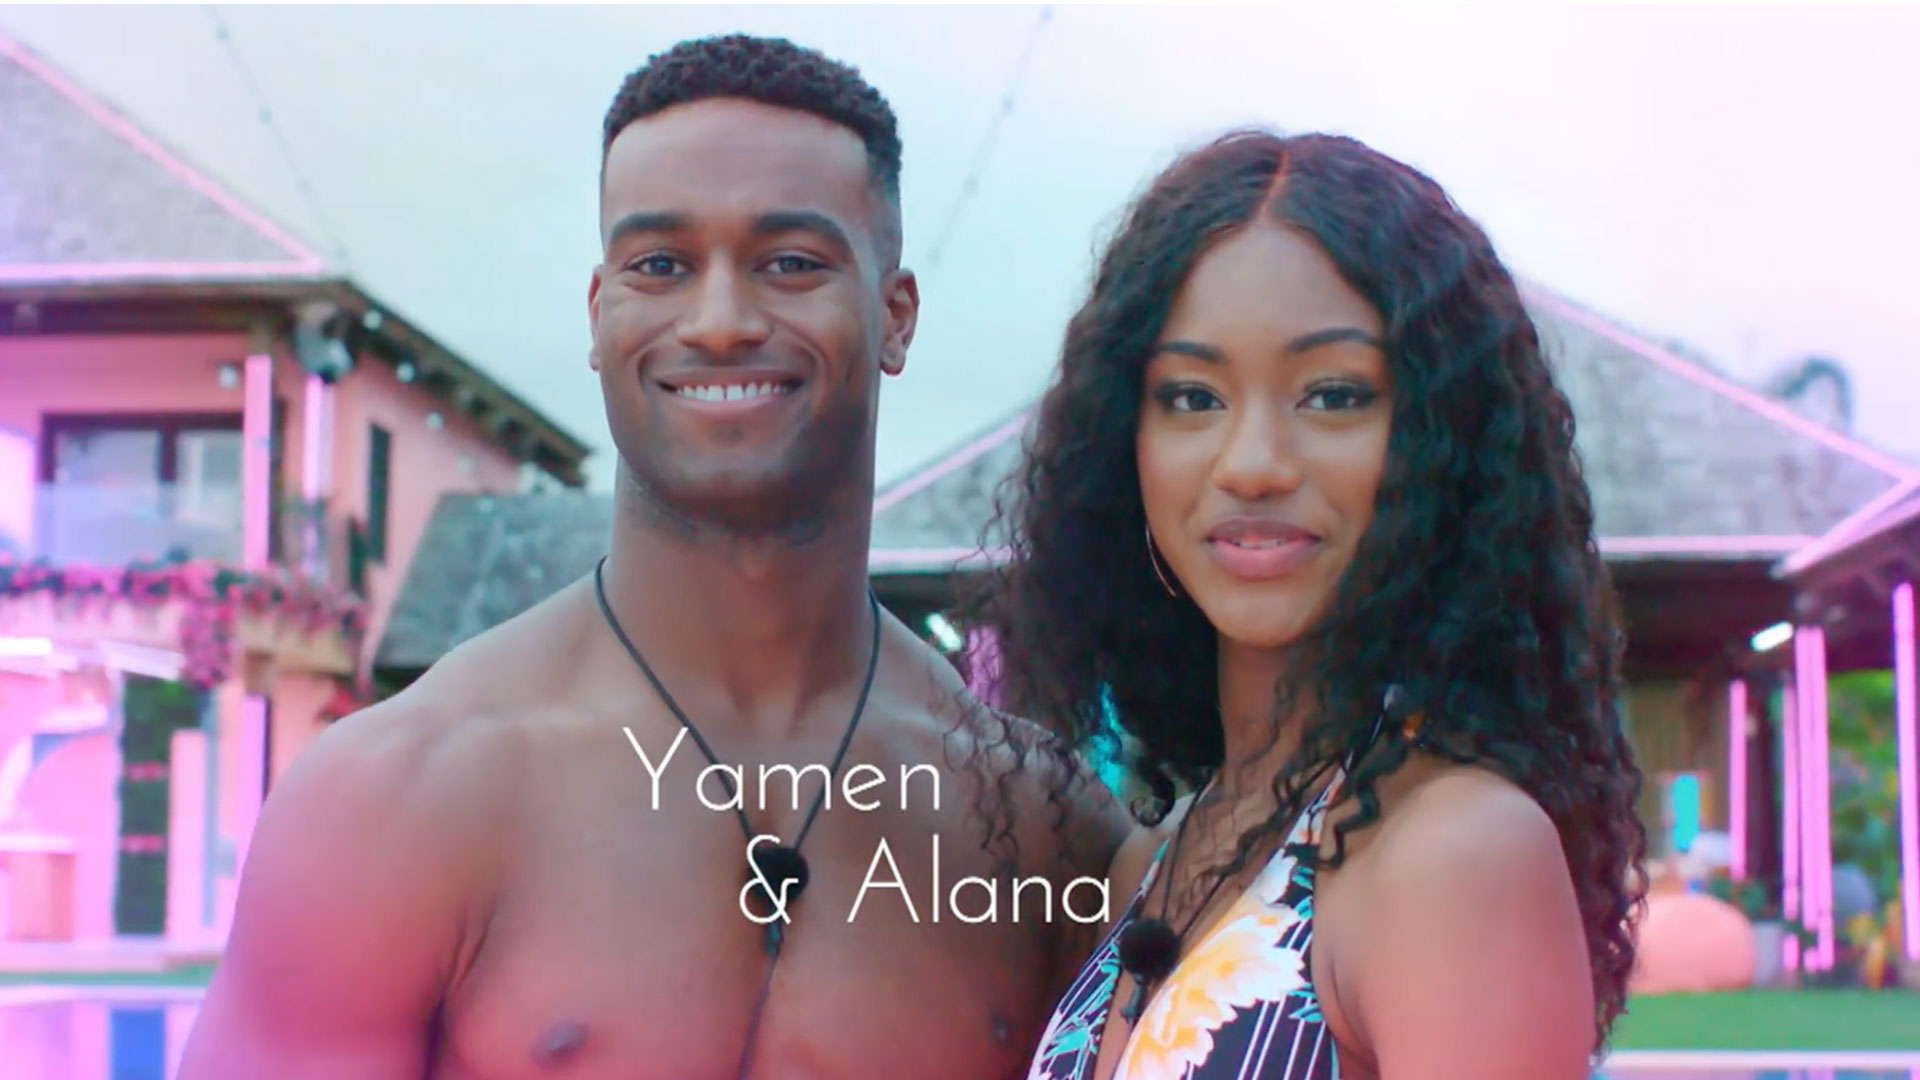 Yamen and Alana